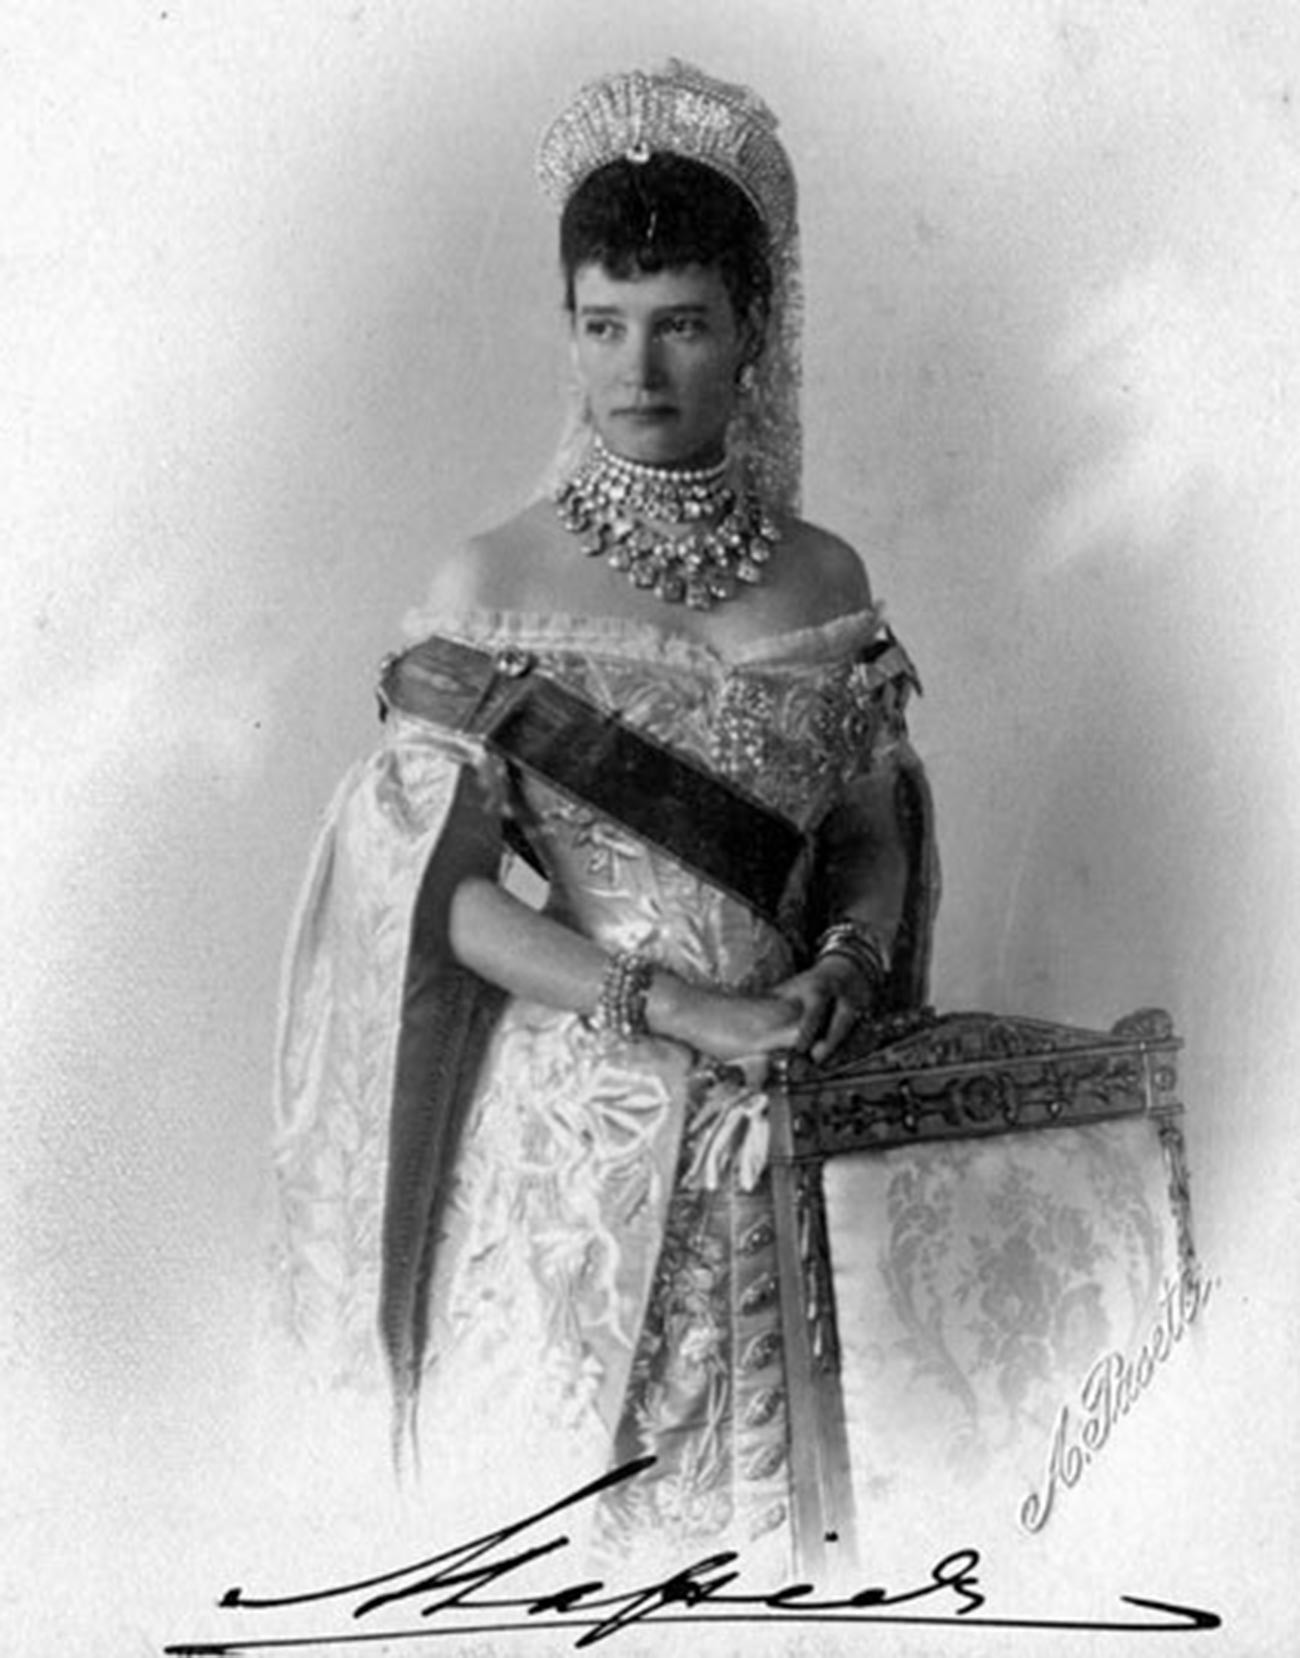 Empress Maria Feodorovna (Dagmar of Denmark, 1847-1928)